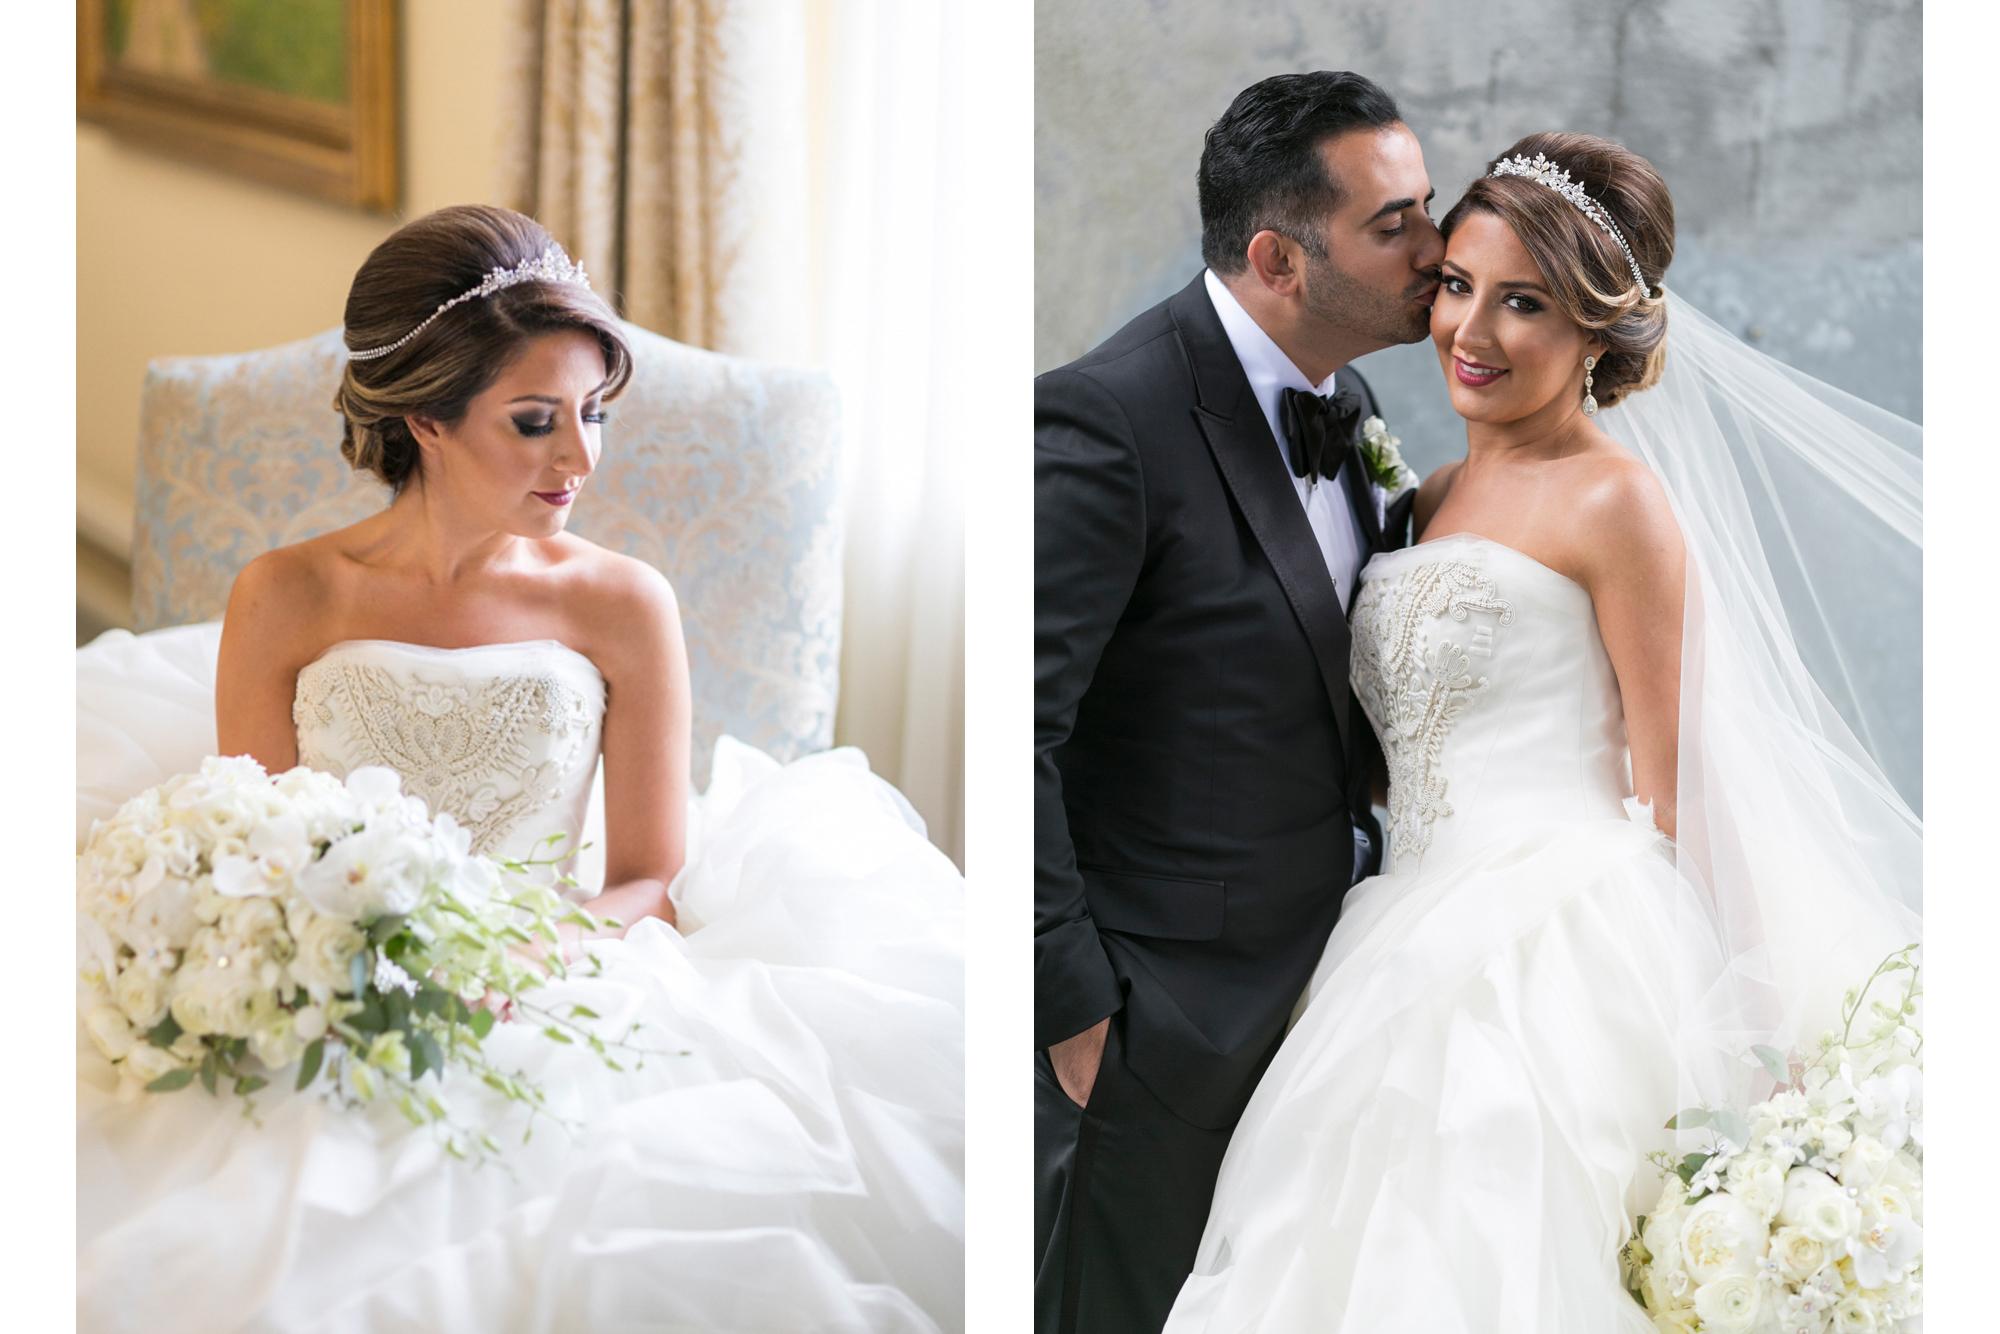 vancouver-luxury-wedding-photographer-lori-miles-13.jpg